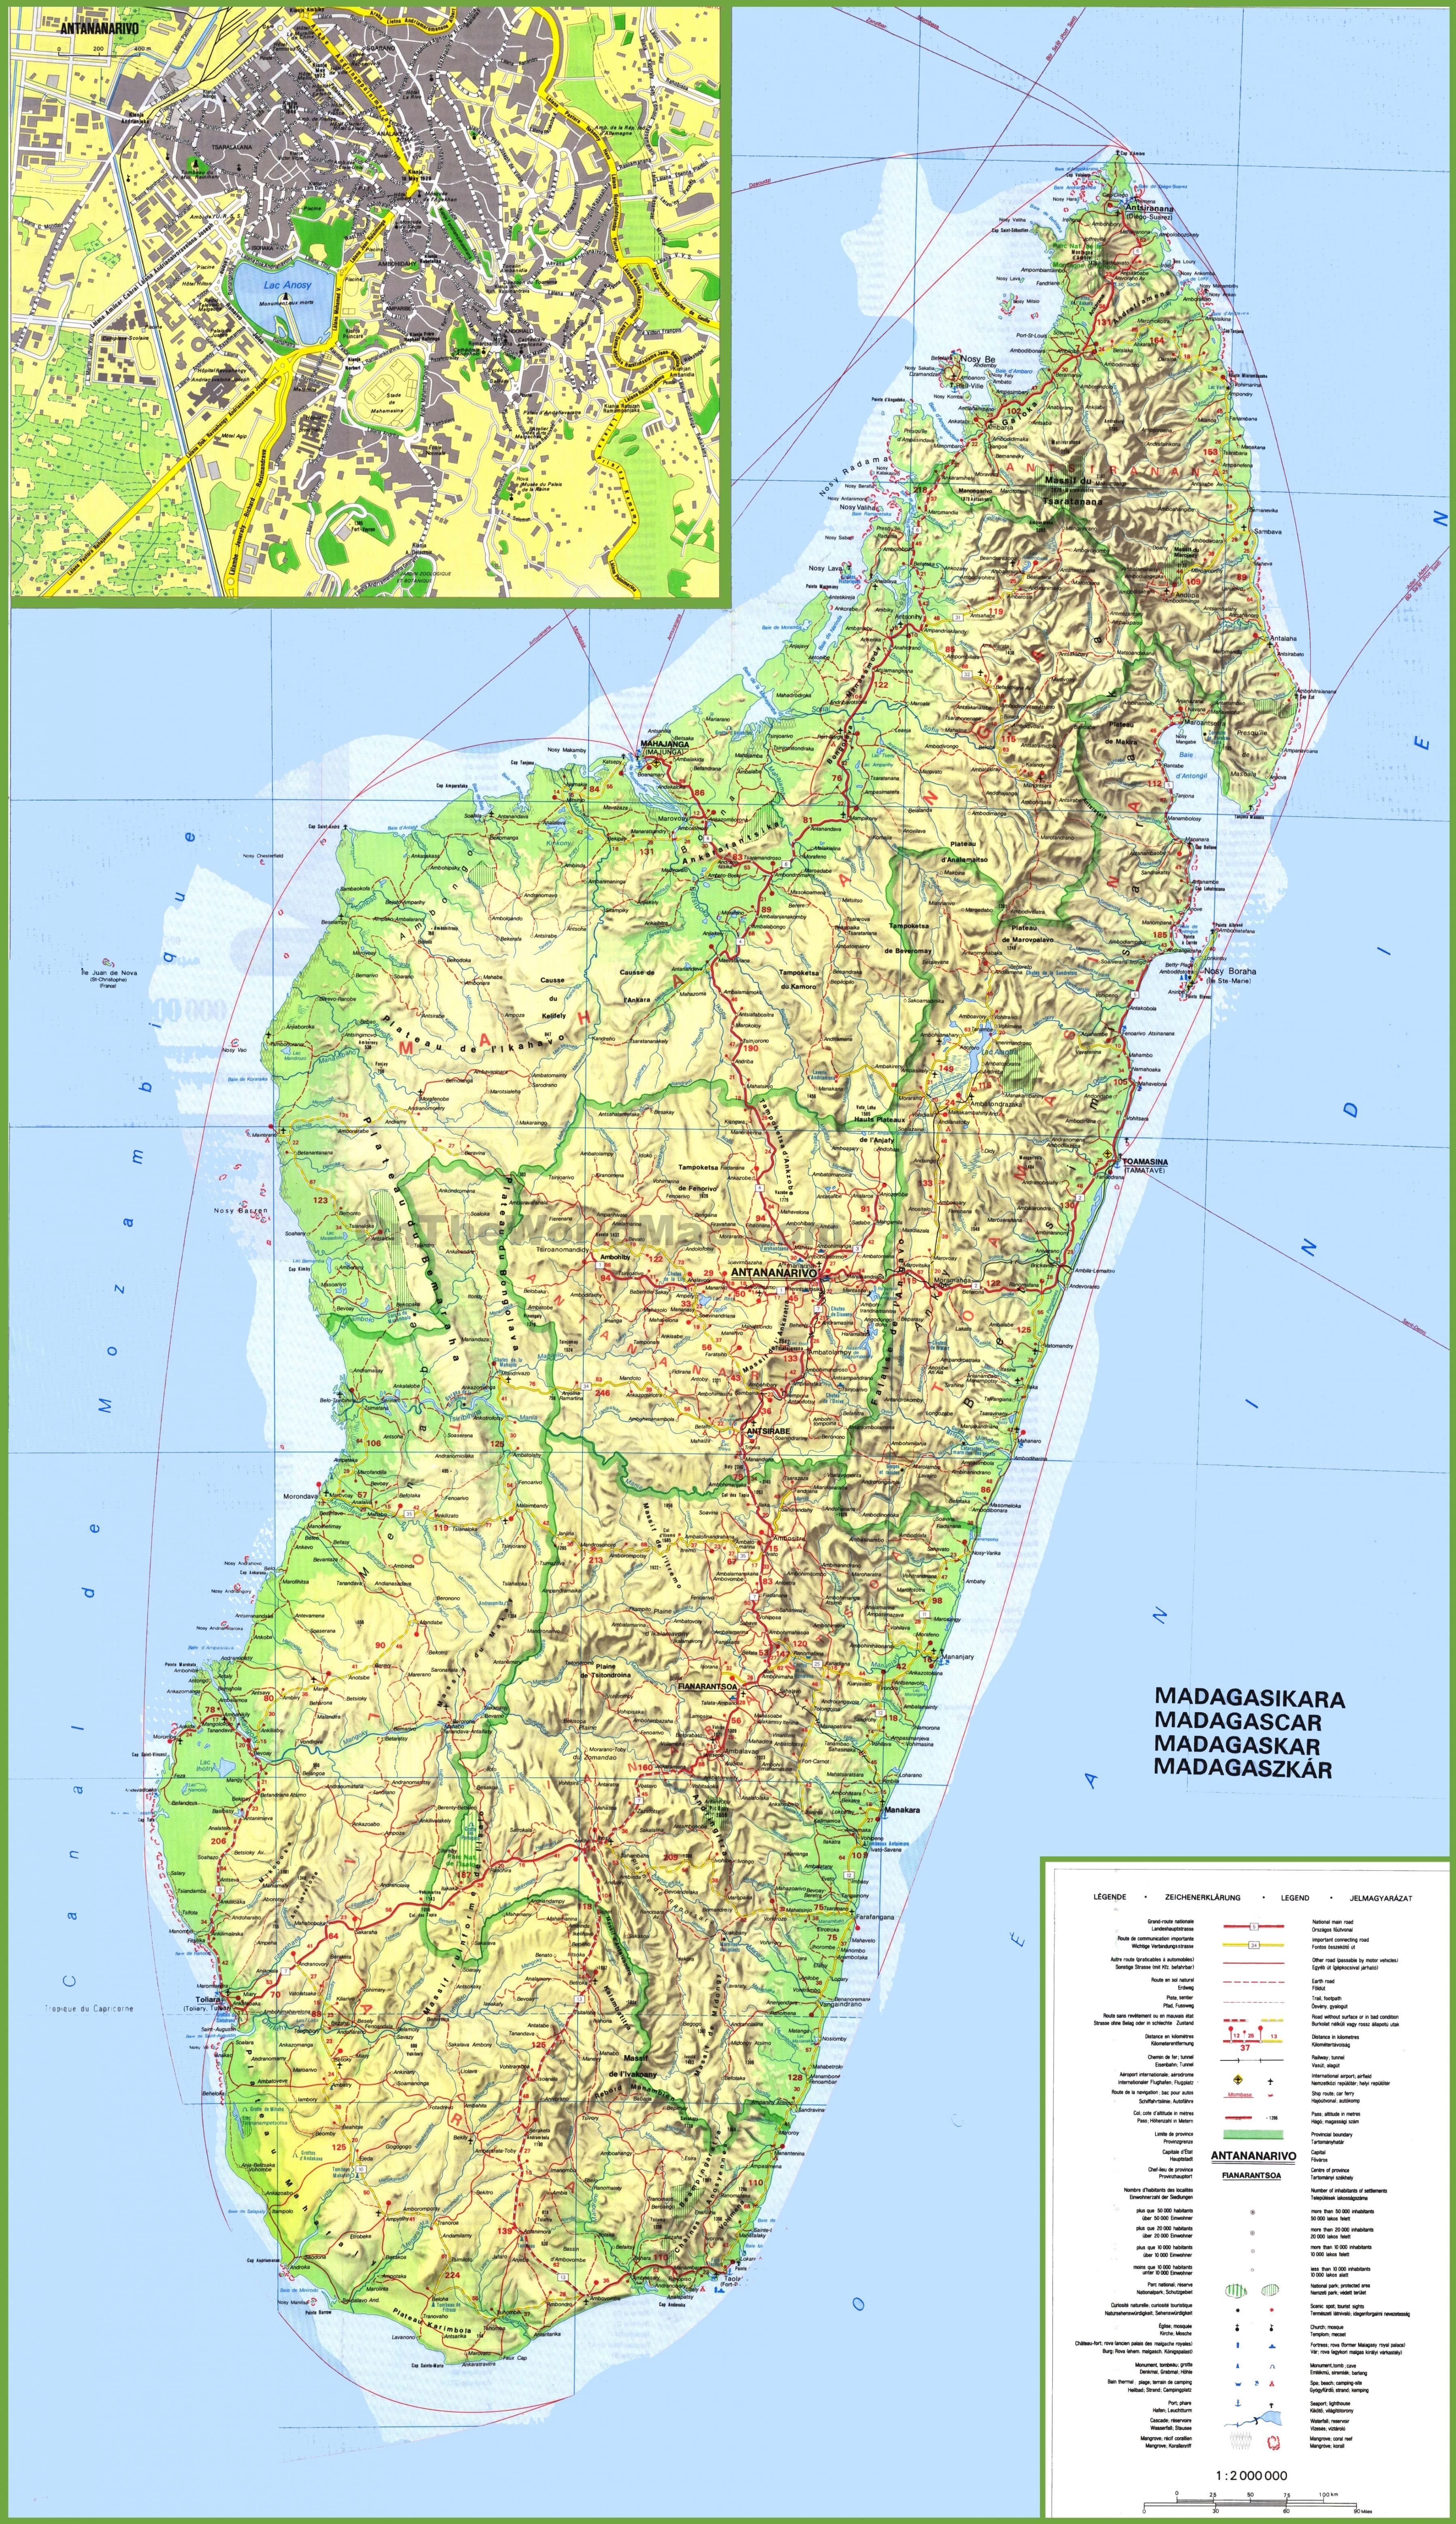 Madagascar Map Map Showing Madagascar Eastern Africa Africa